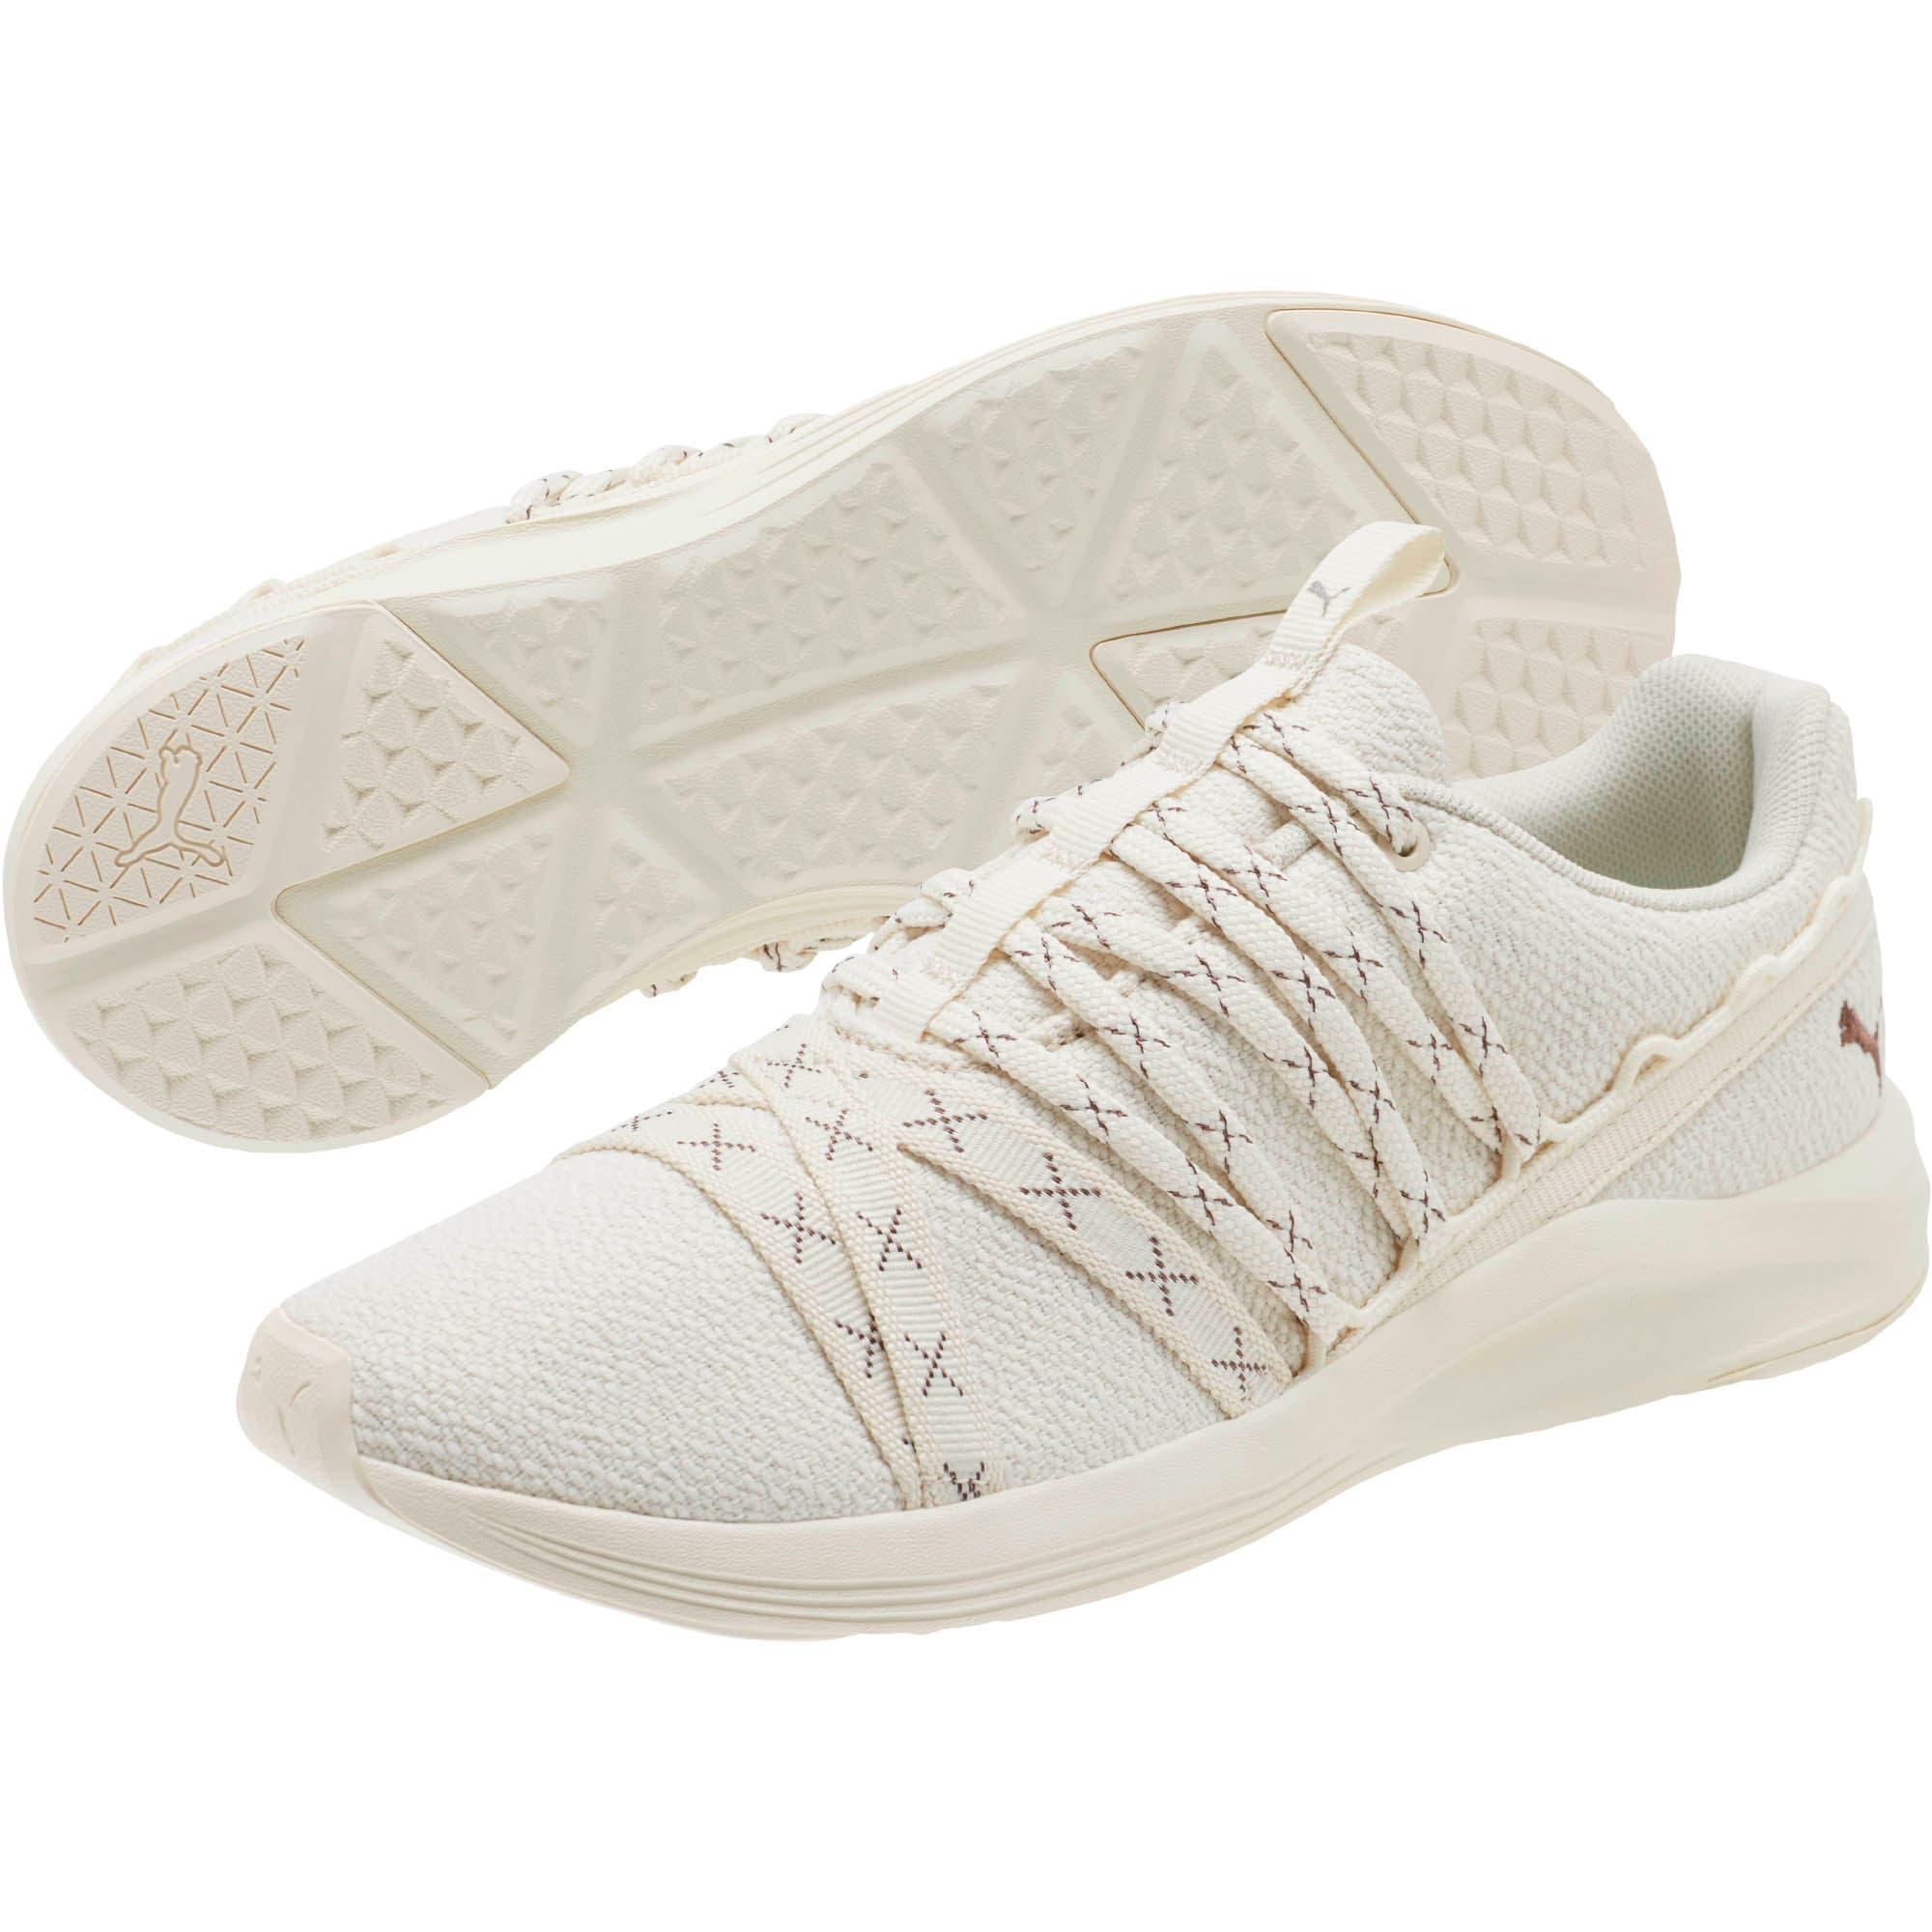 Thumbnail 2 of Prowl Alt 2 LX Women's Training Shoes, Whisper White, medium